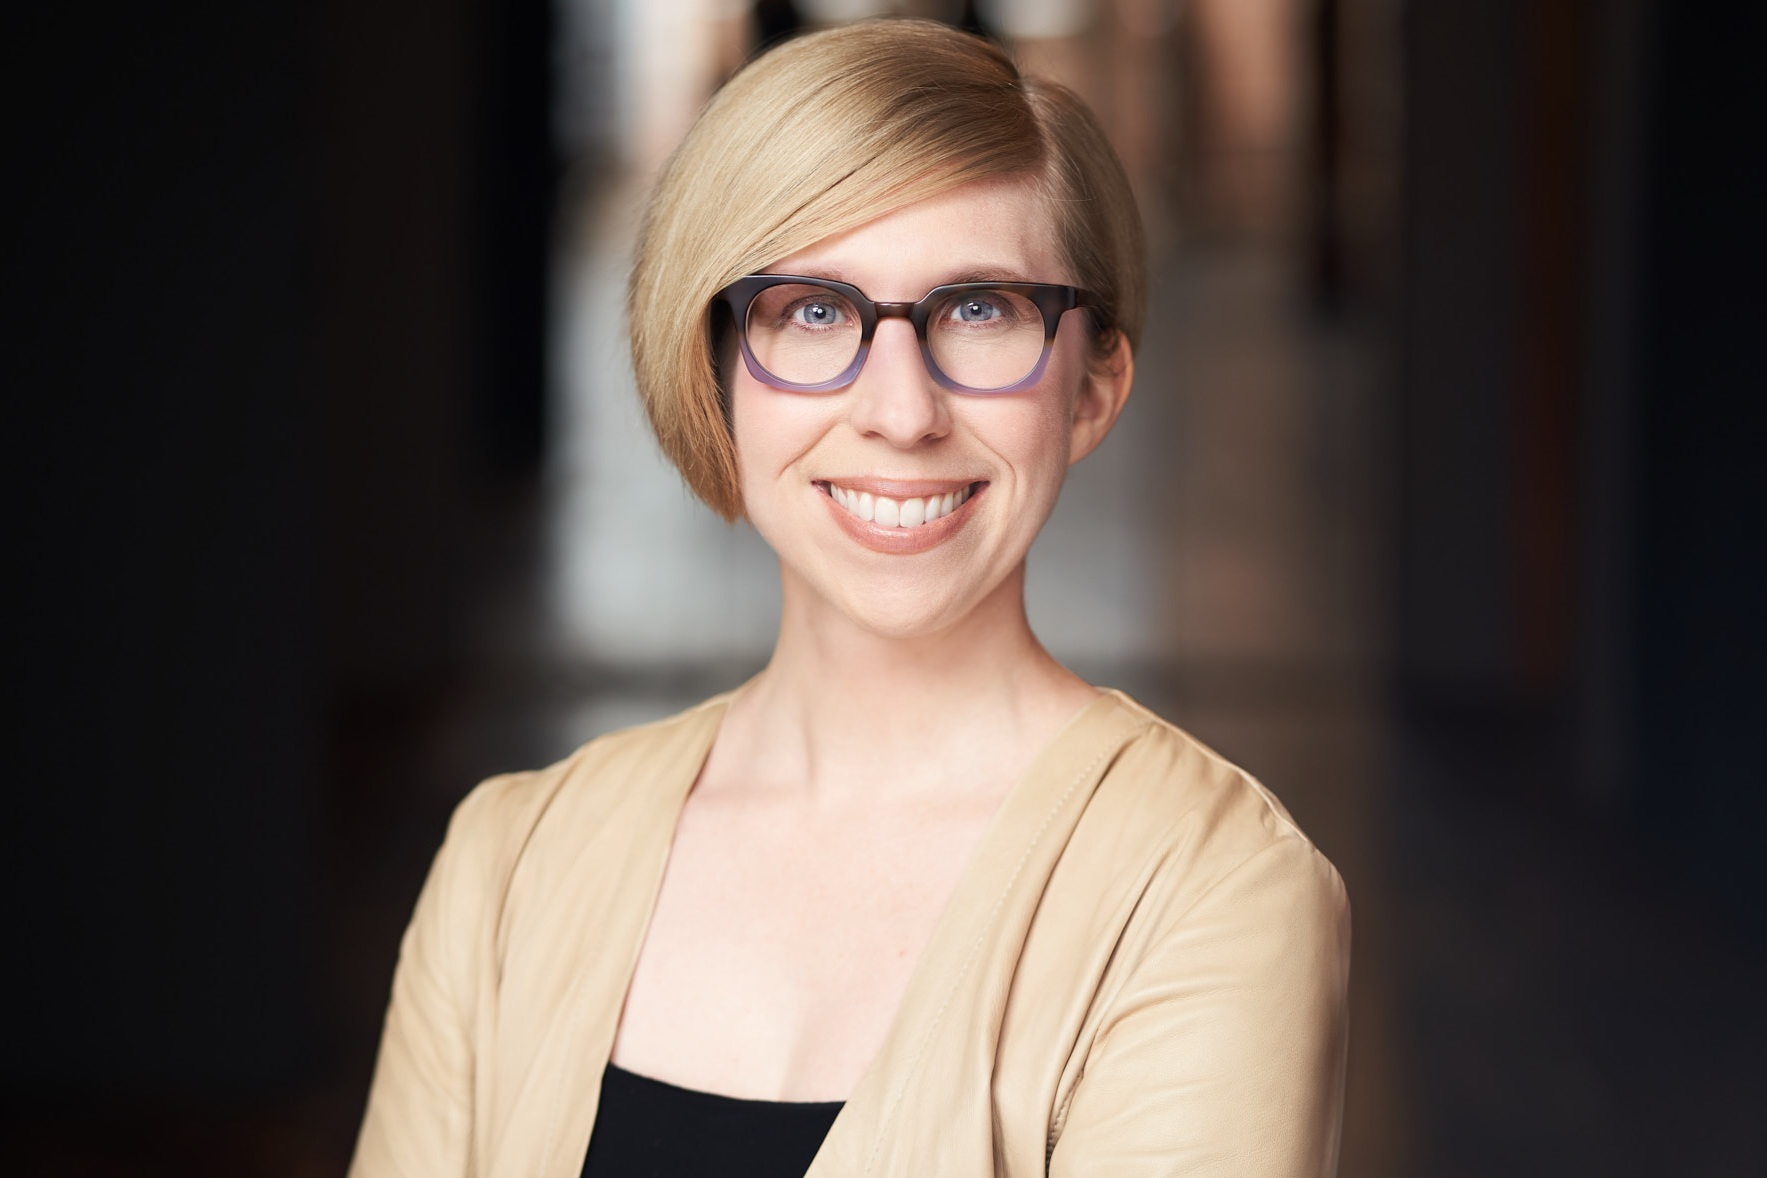 Heather-McDougall-headshot-5.jpg